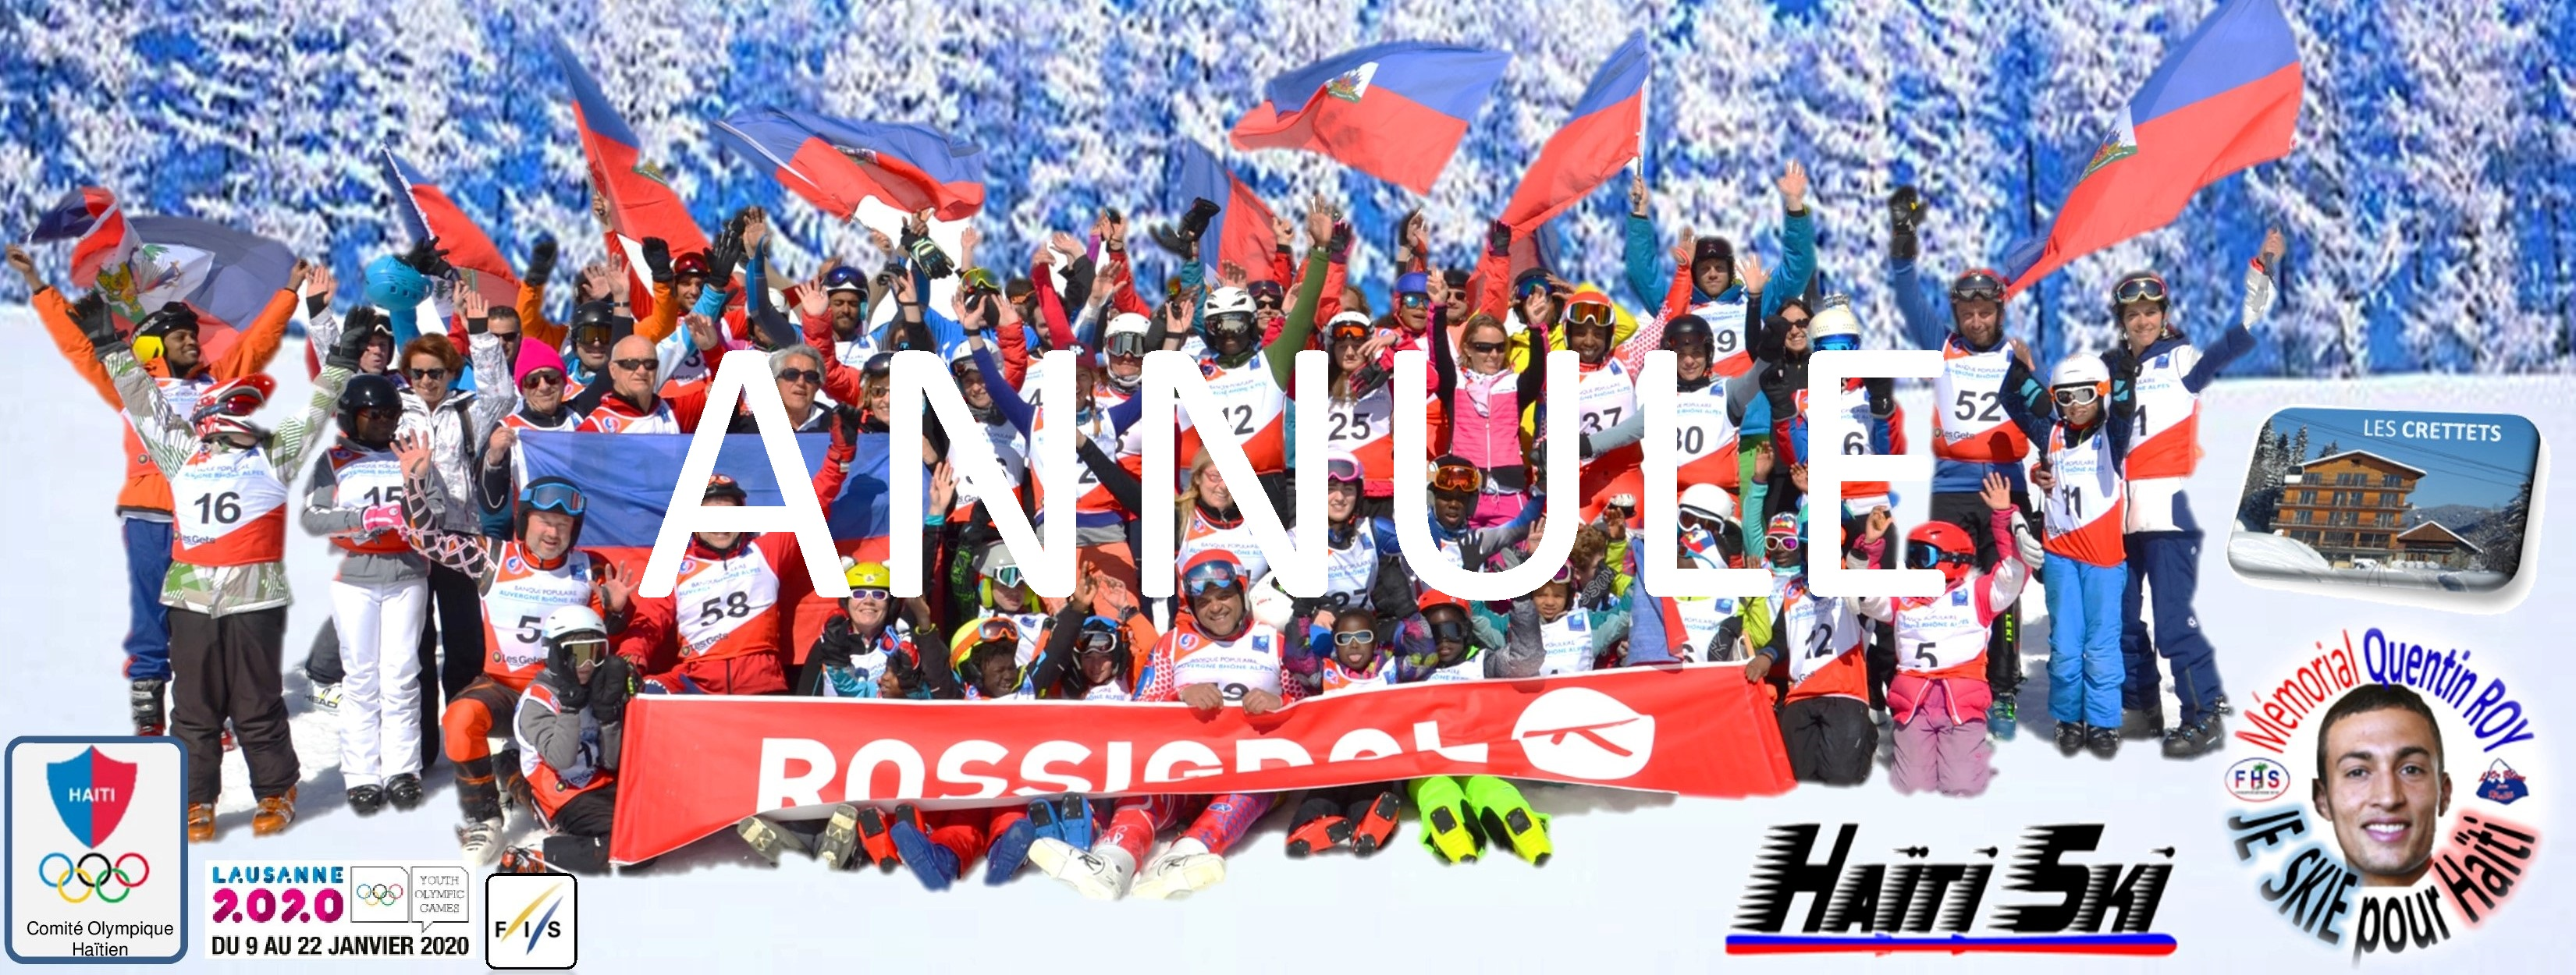 JE SKIE POUR HAITI 2020 - ANNULE CORONAVIRUS